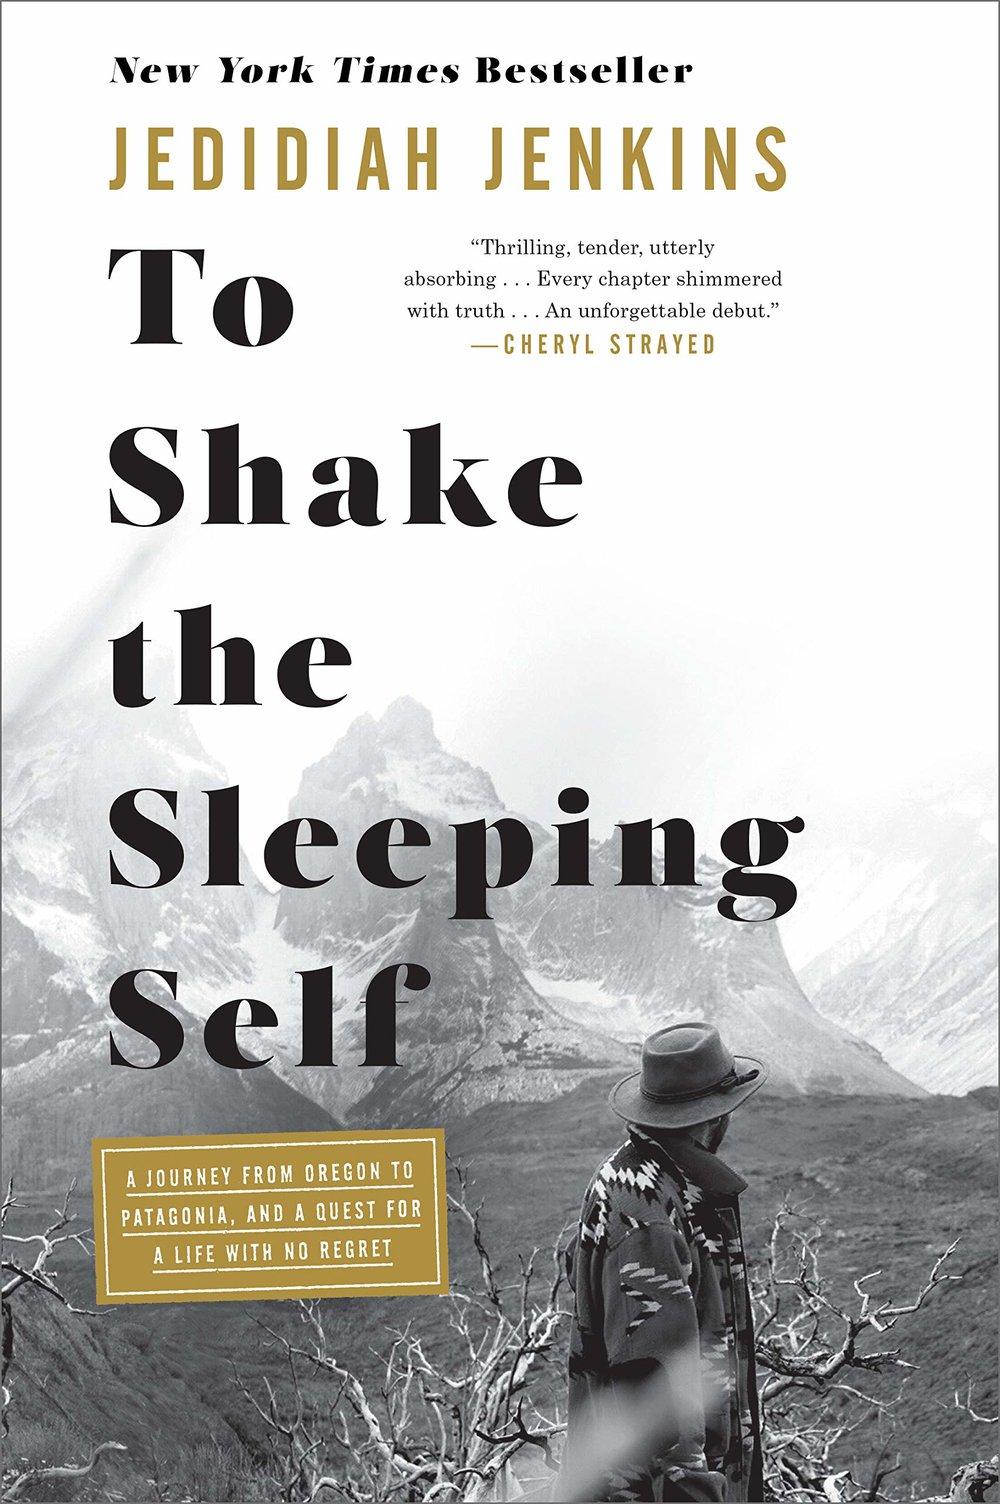 Inspiring Travel Memoirs - To Shake the Sleeping Self by Jedediah Jenkins